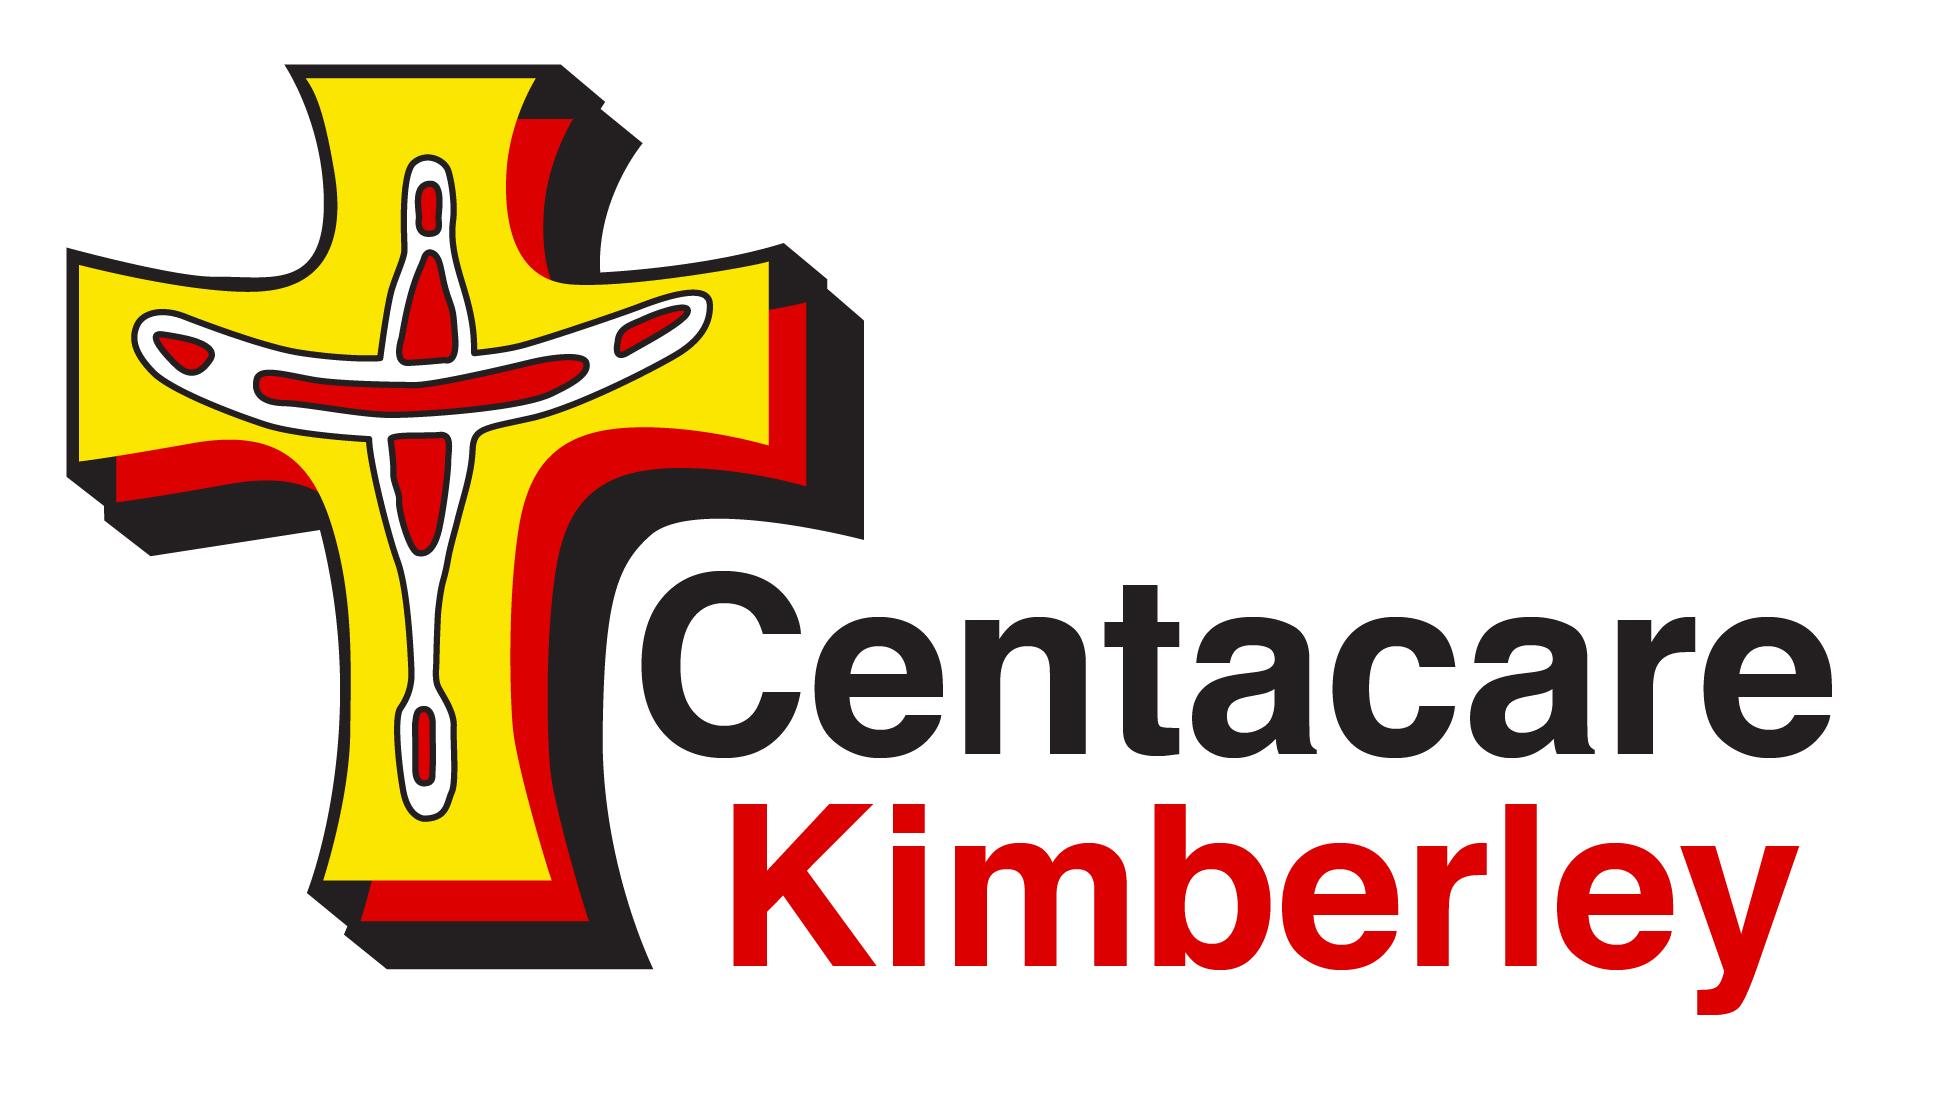 Centacare Kimberley